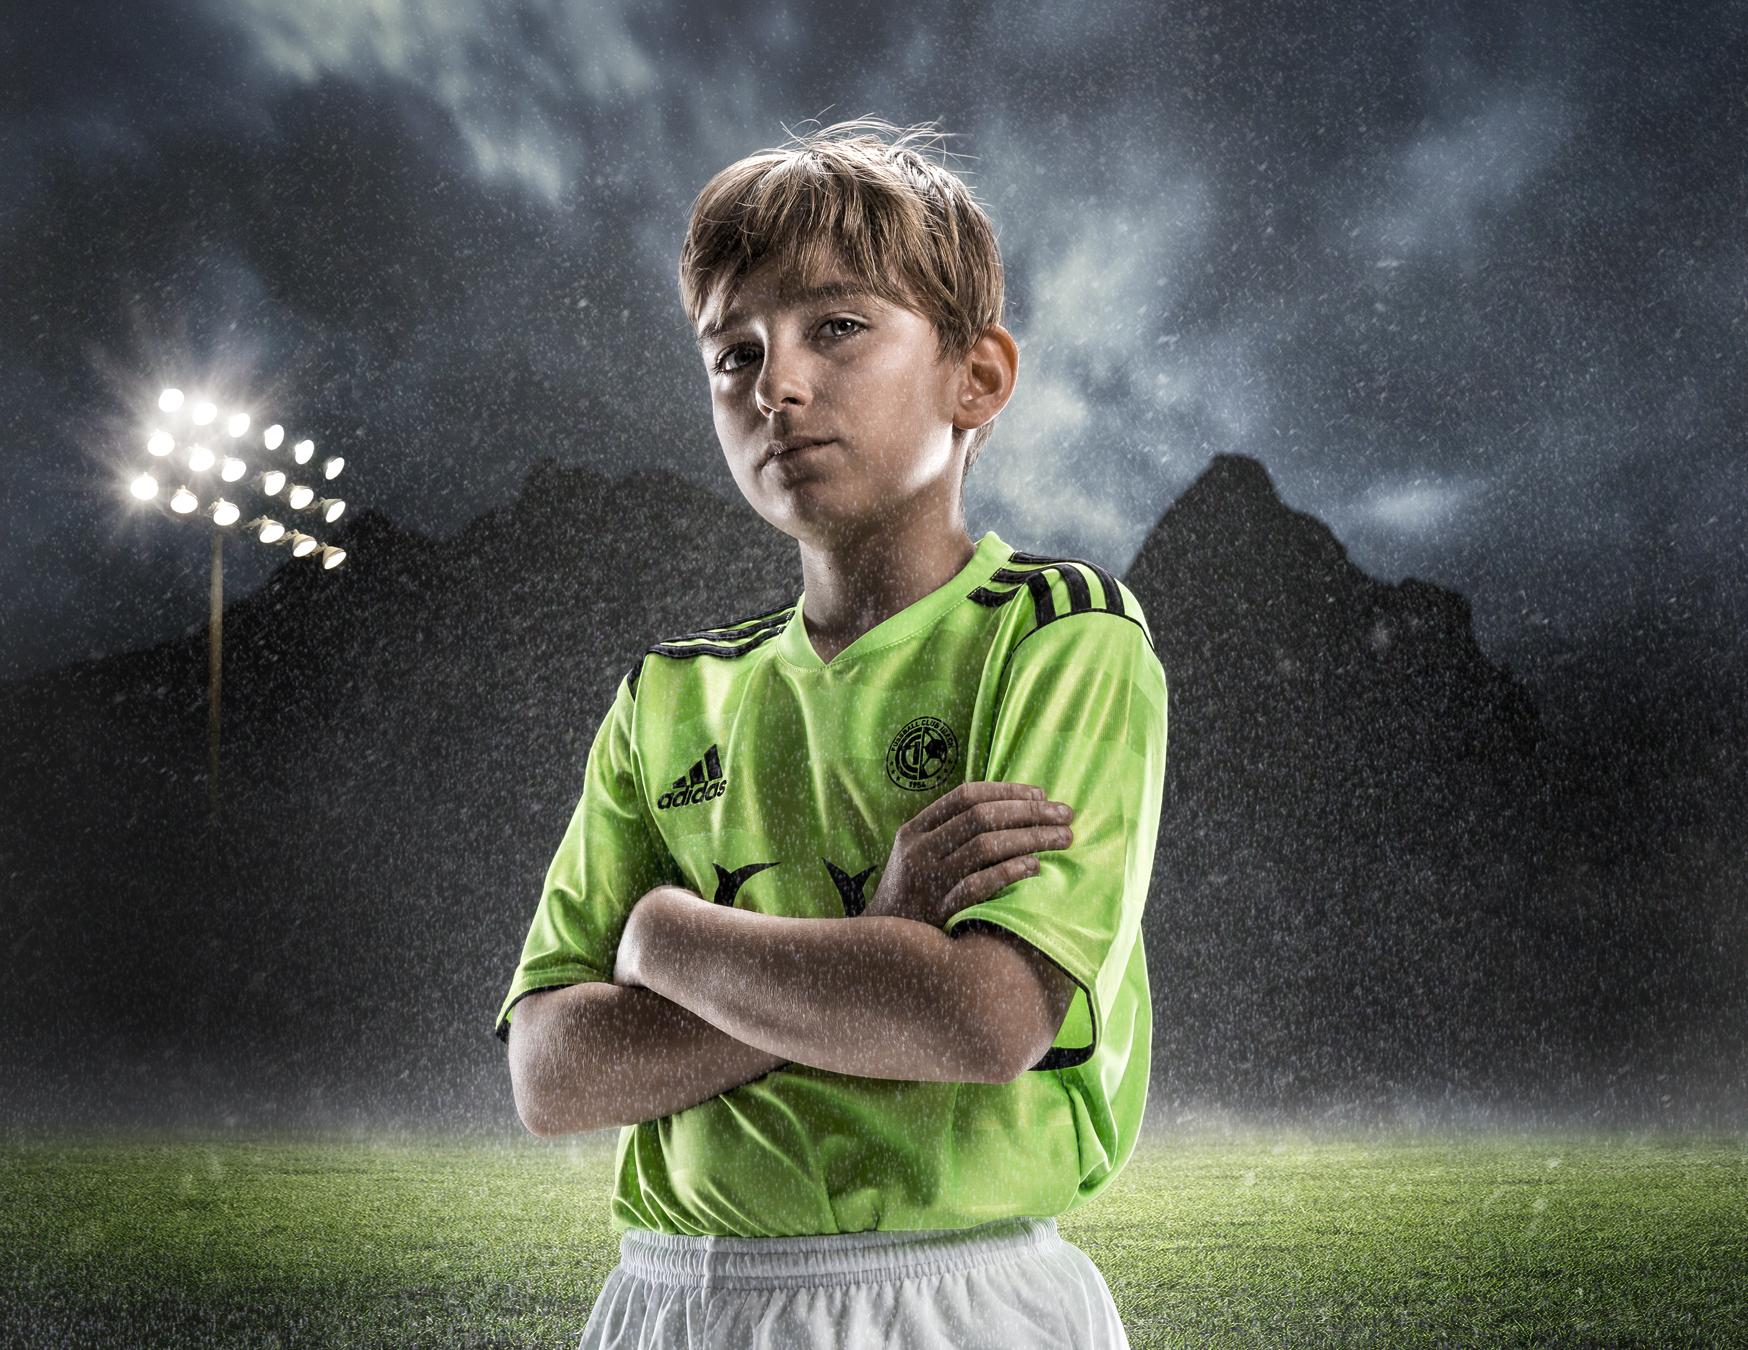 Meier & Kamer Fotografie, Composing und Bildbearbeitung: Junioren FC Ibach